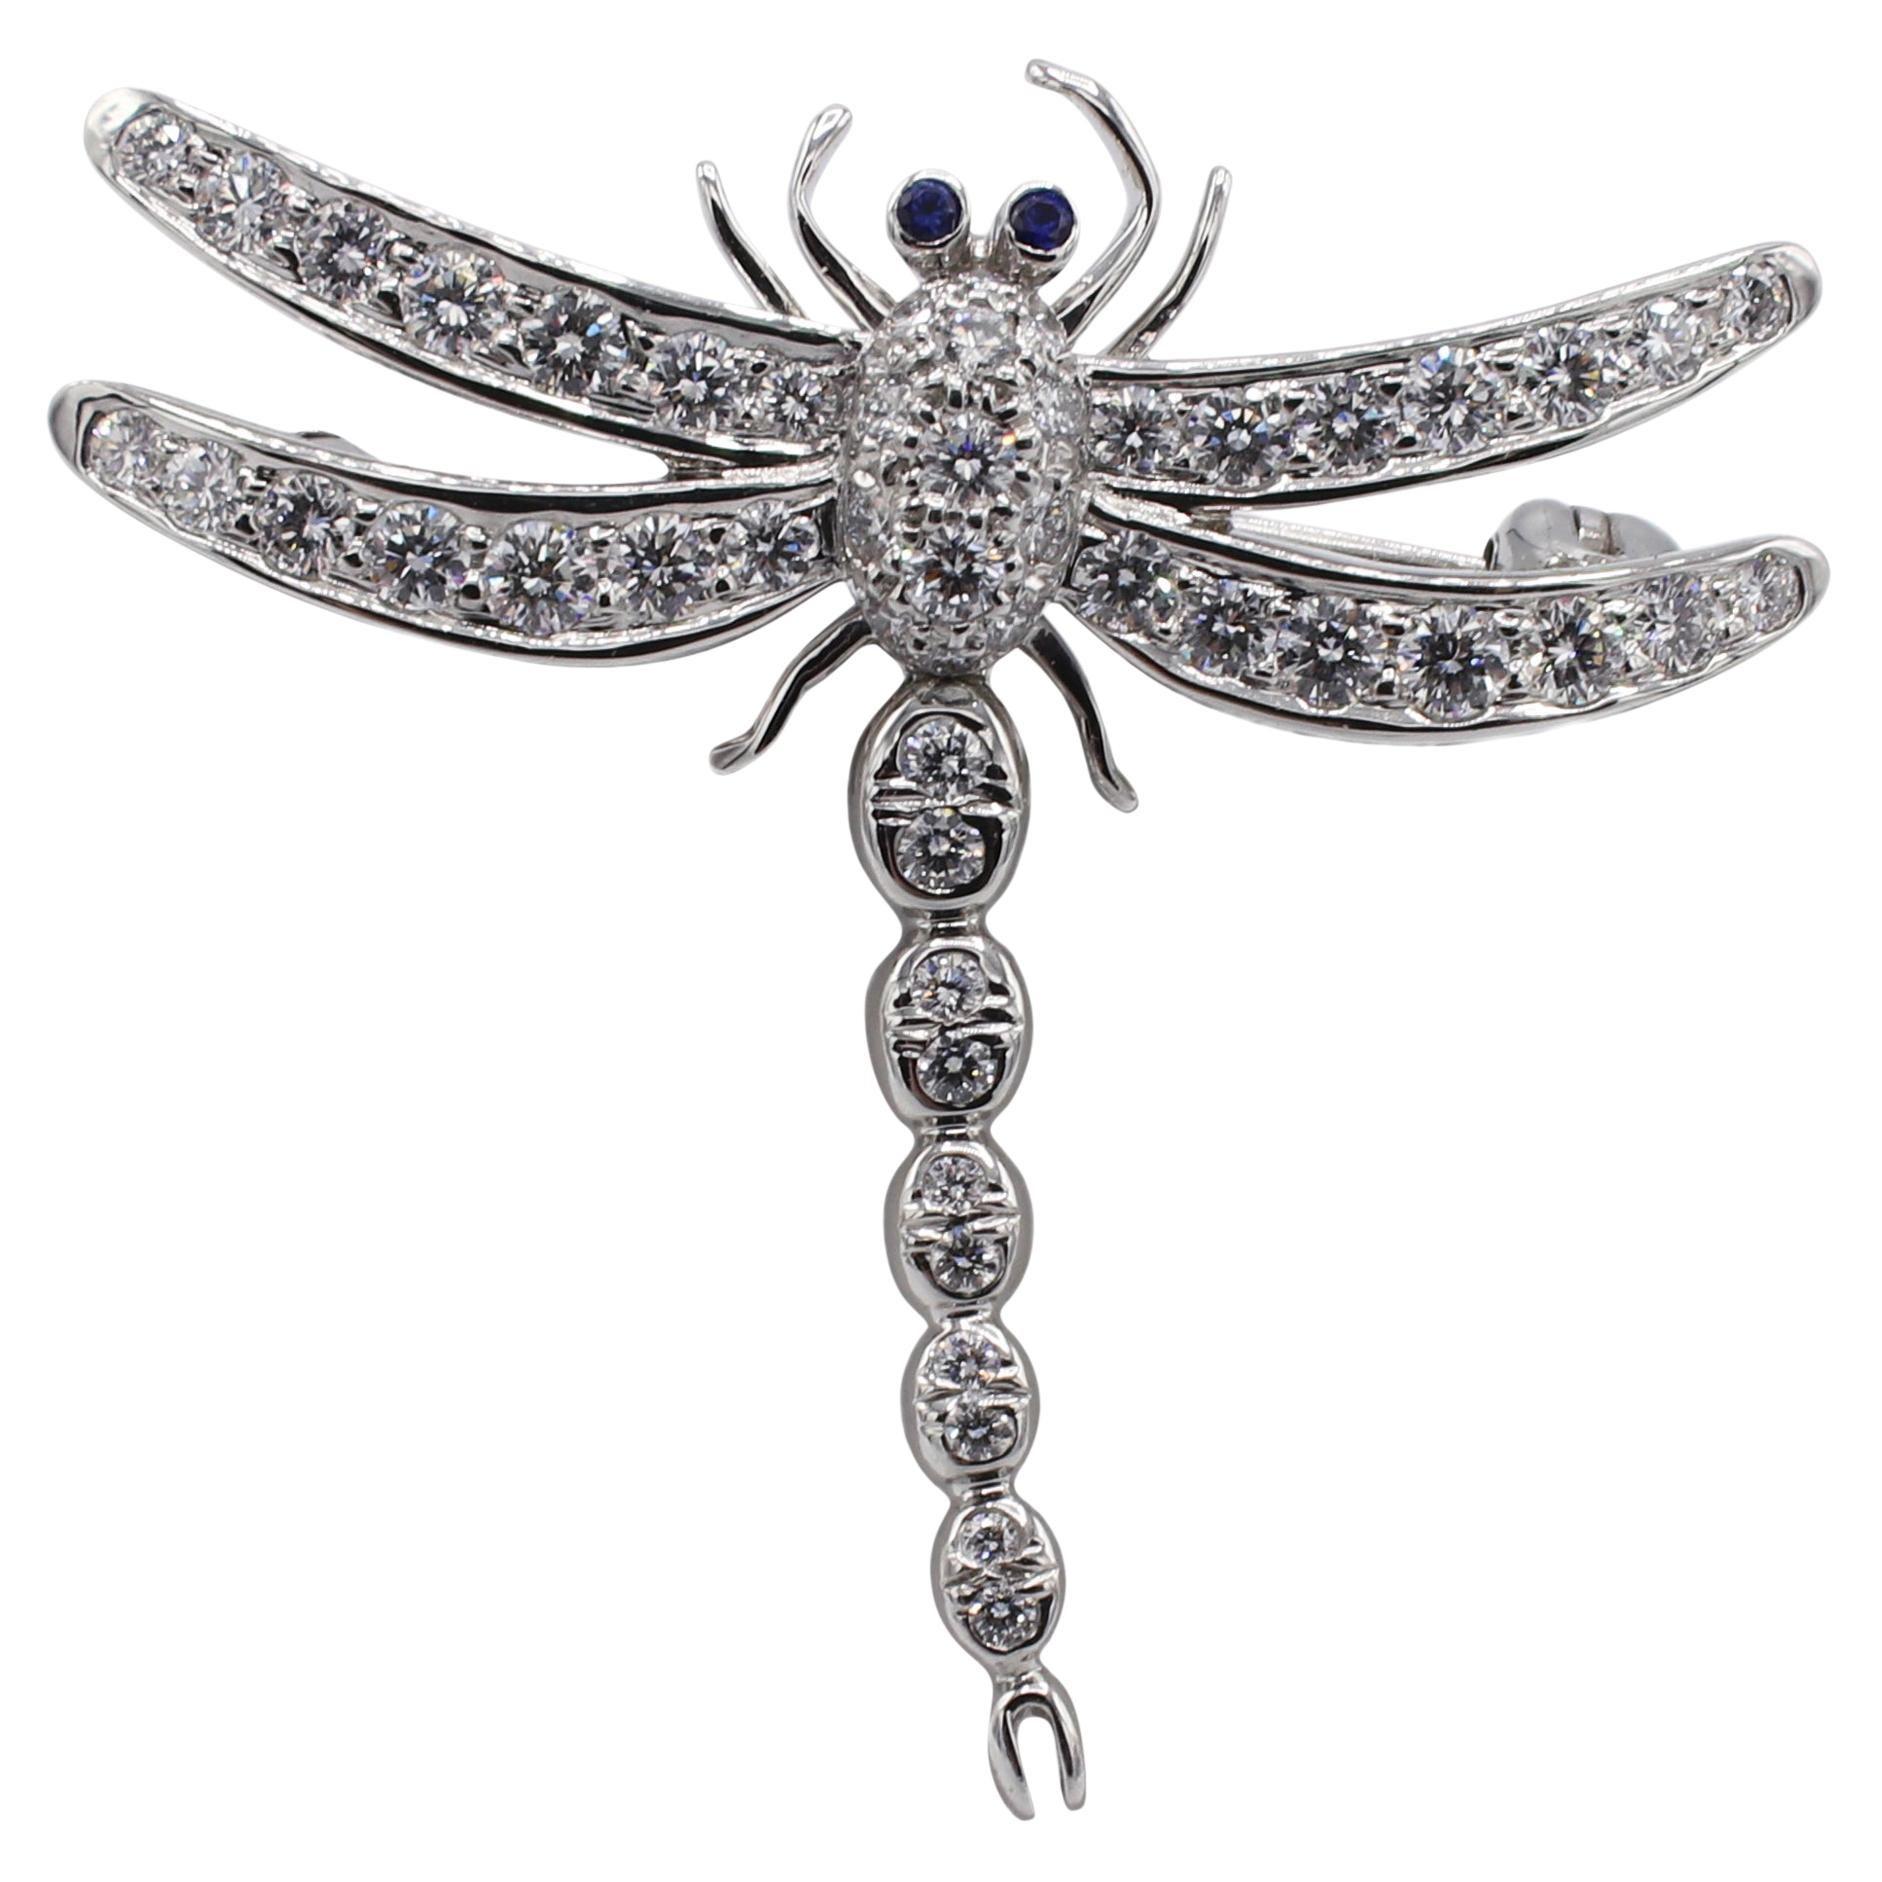 Tiffany & Co. Enchant Platinum Diamond & Sapphire Dragonfly Pin Brooch